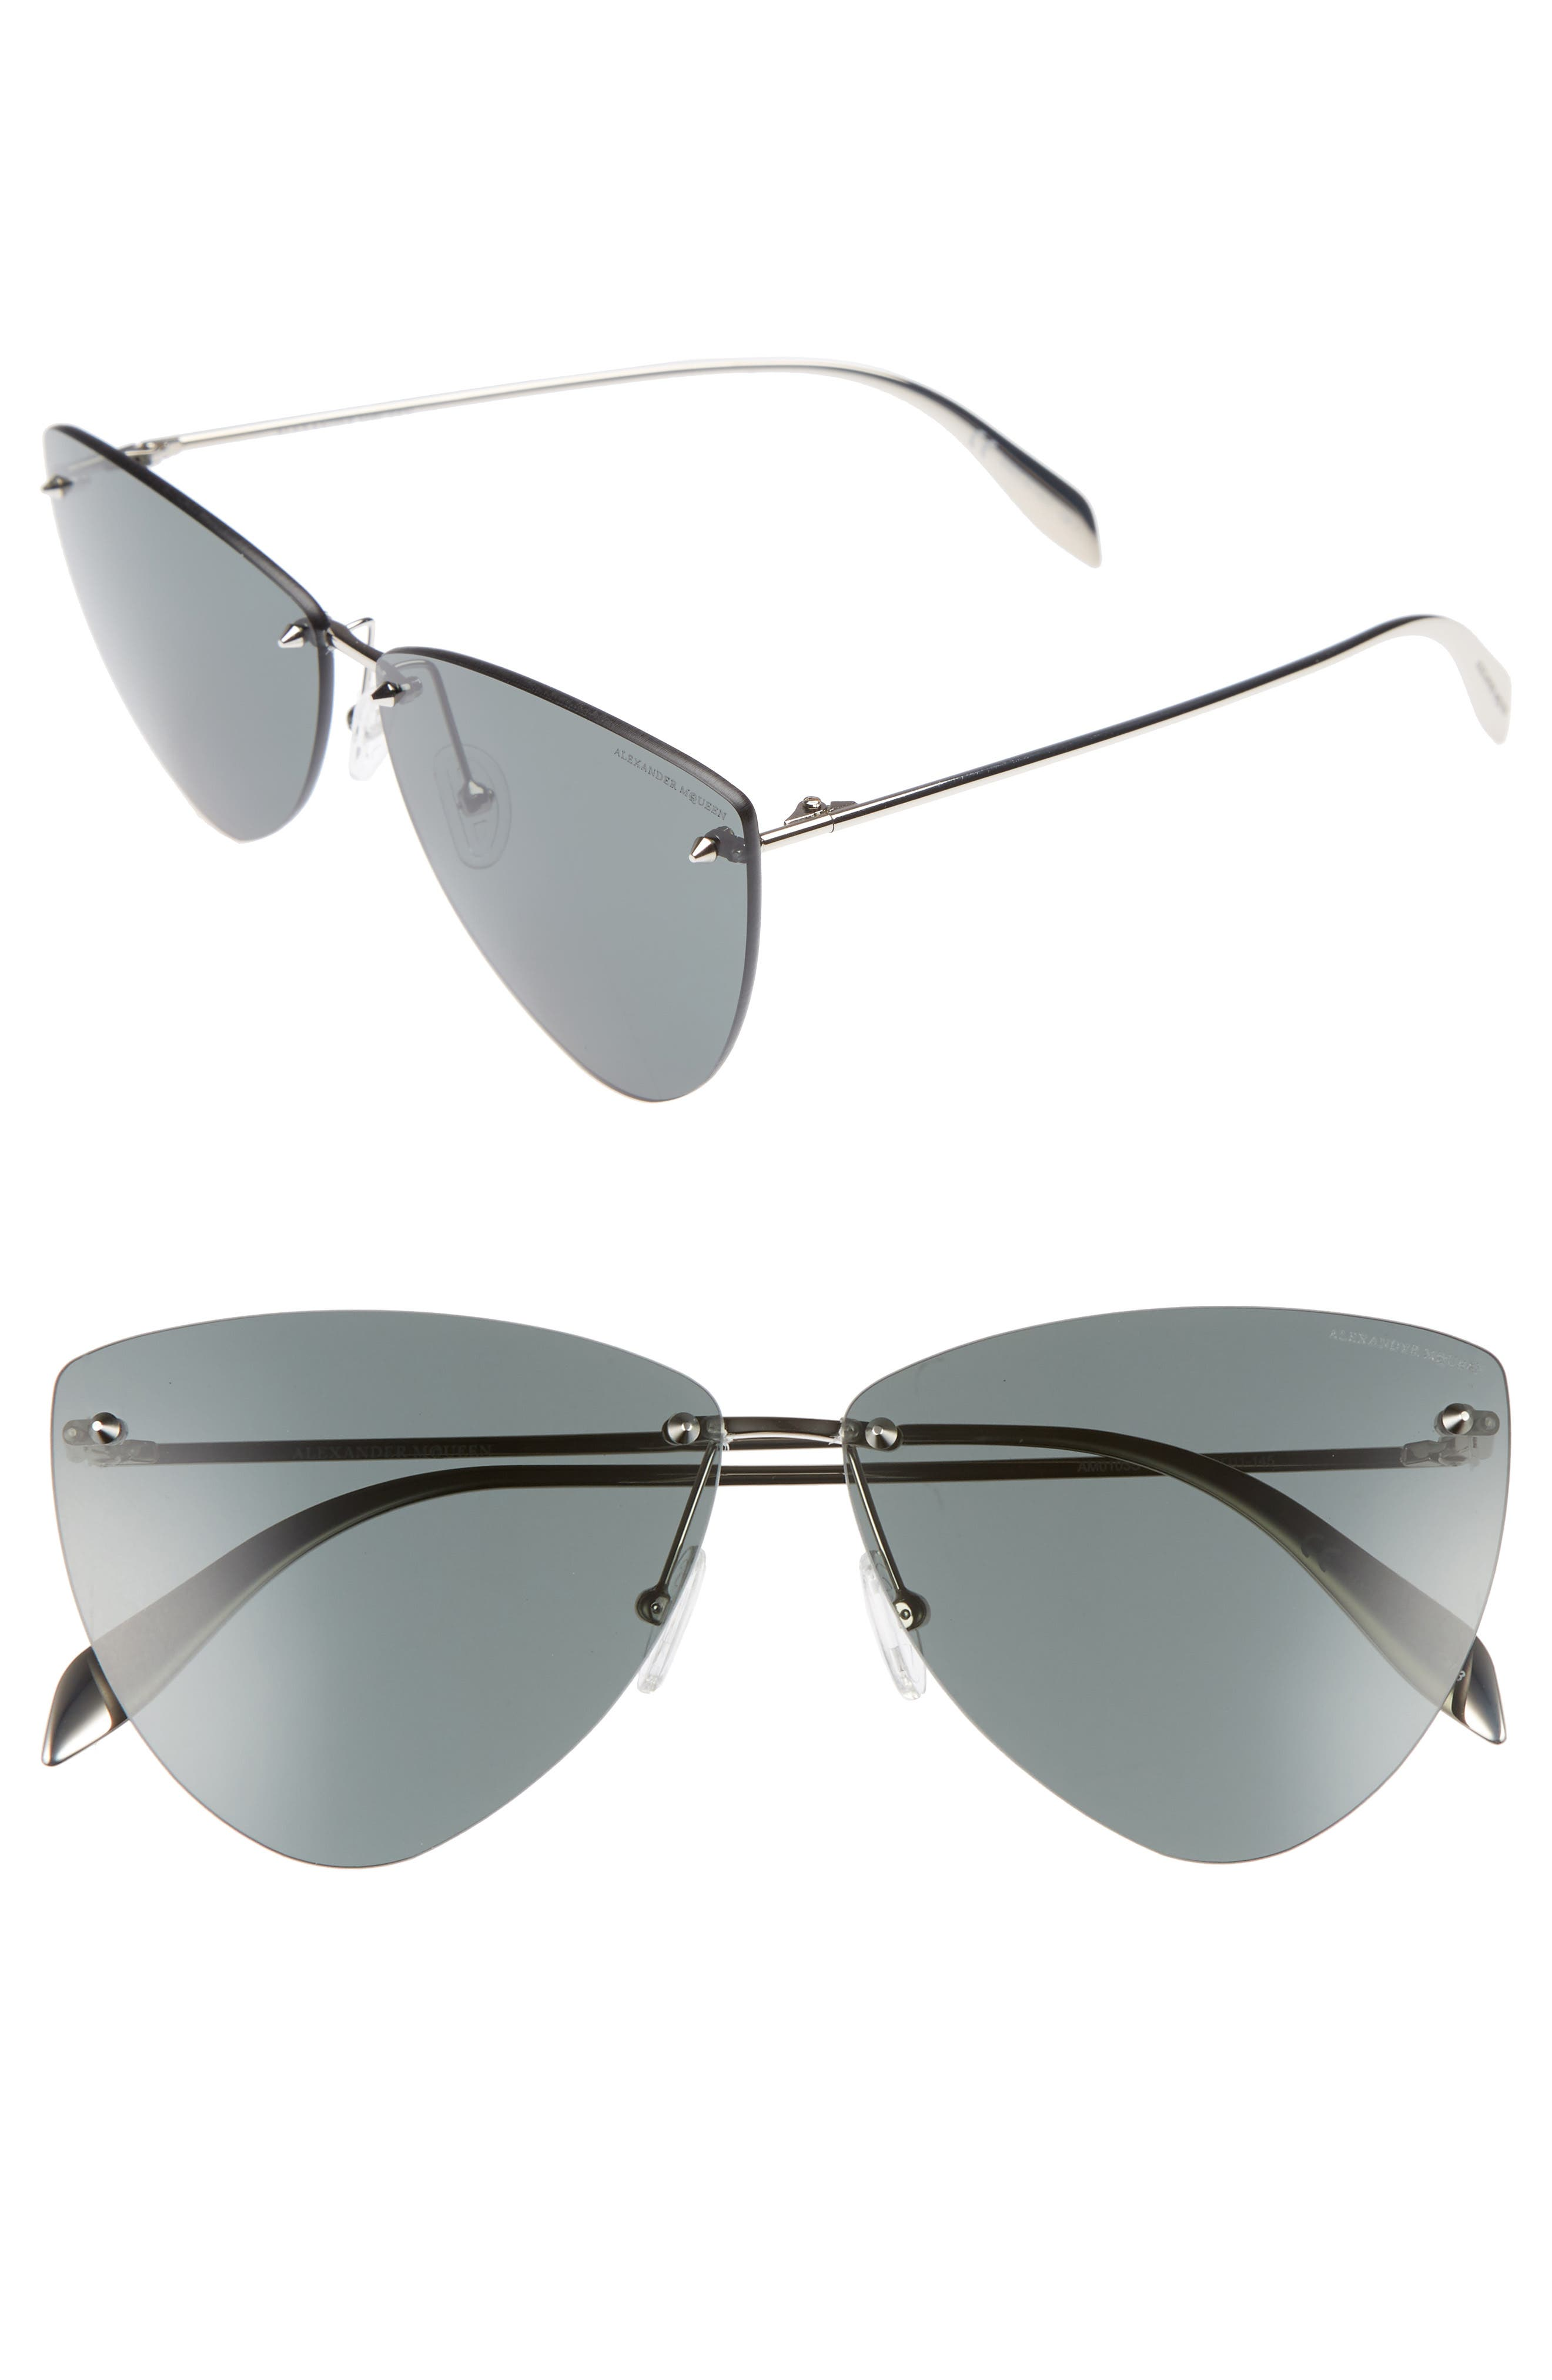 63mm Oversize Rimless Sunglasses,                         Main,                         color, Silver